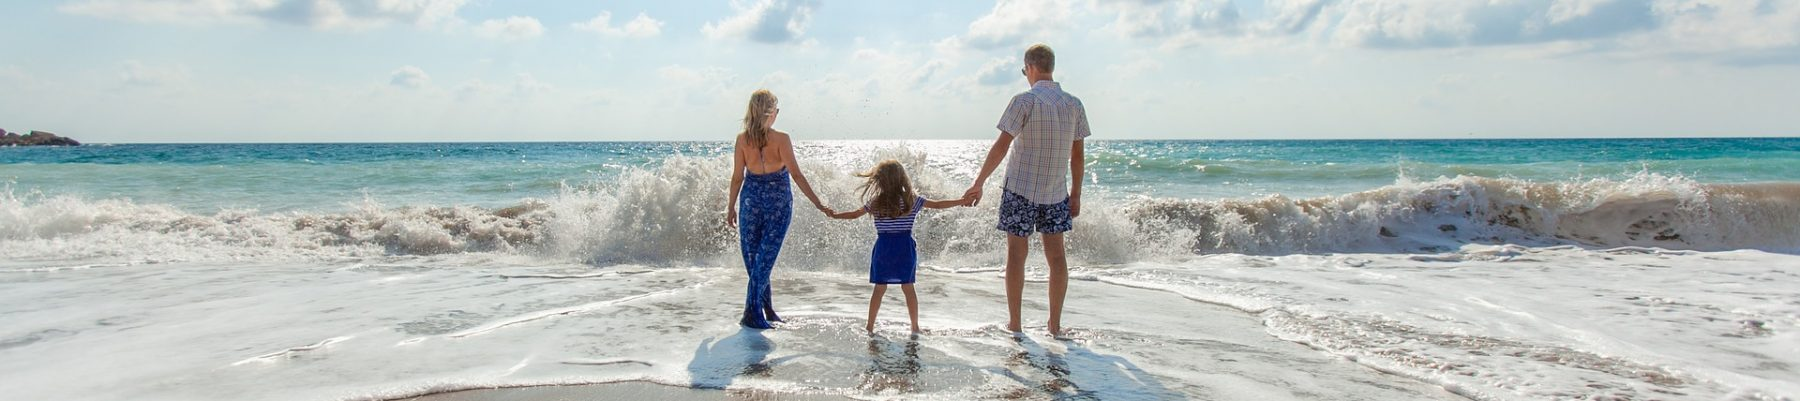 Porodične avanture